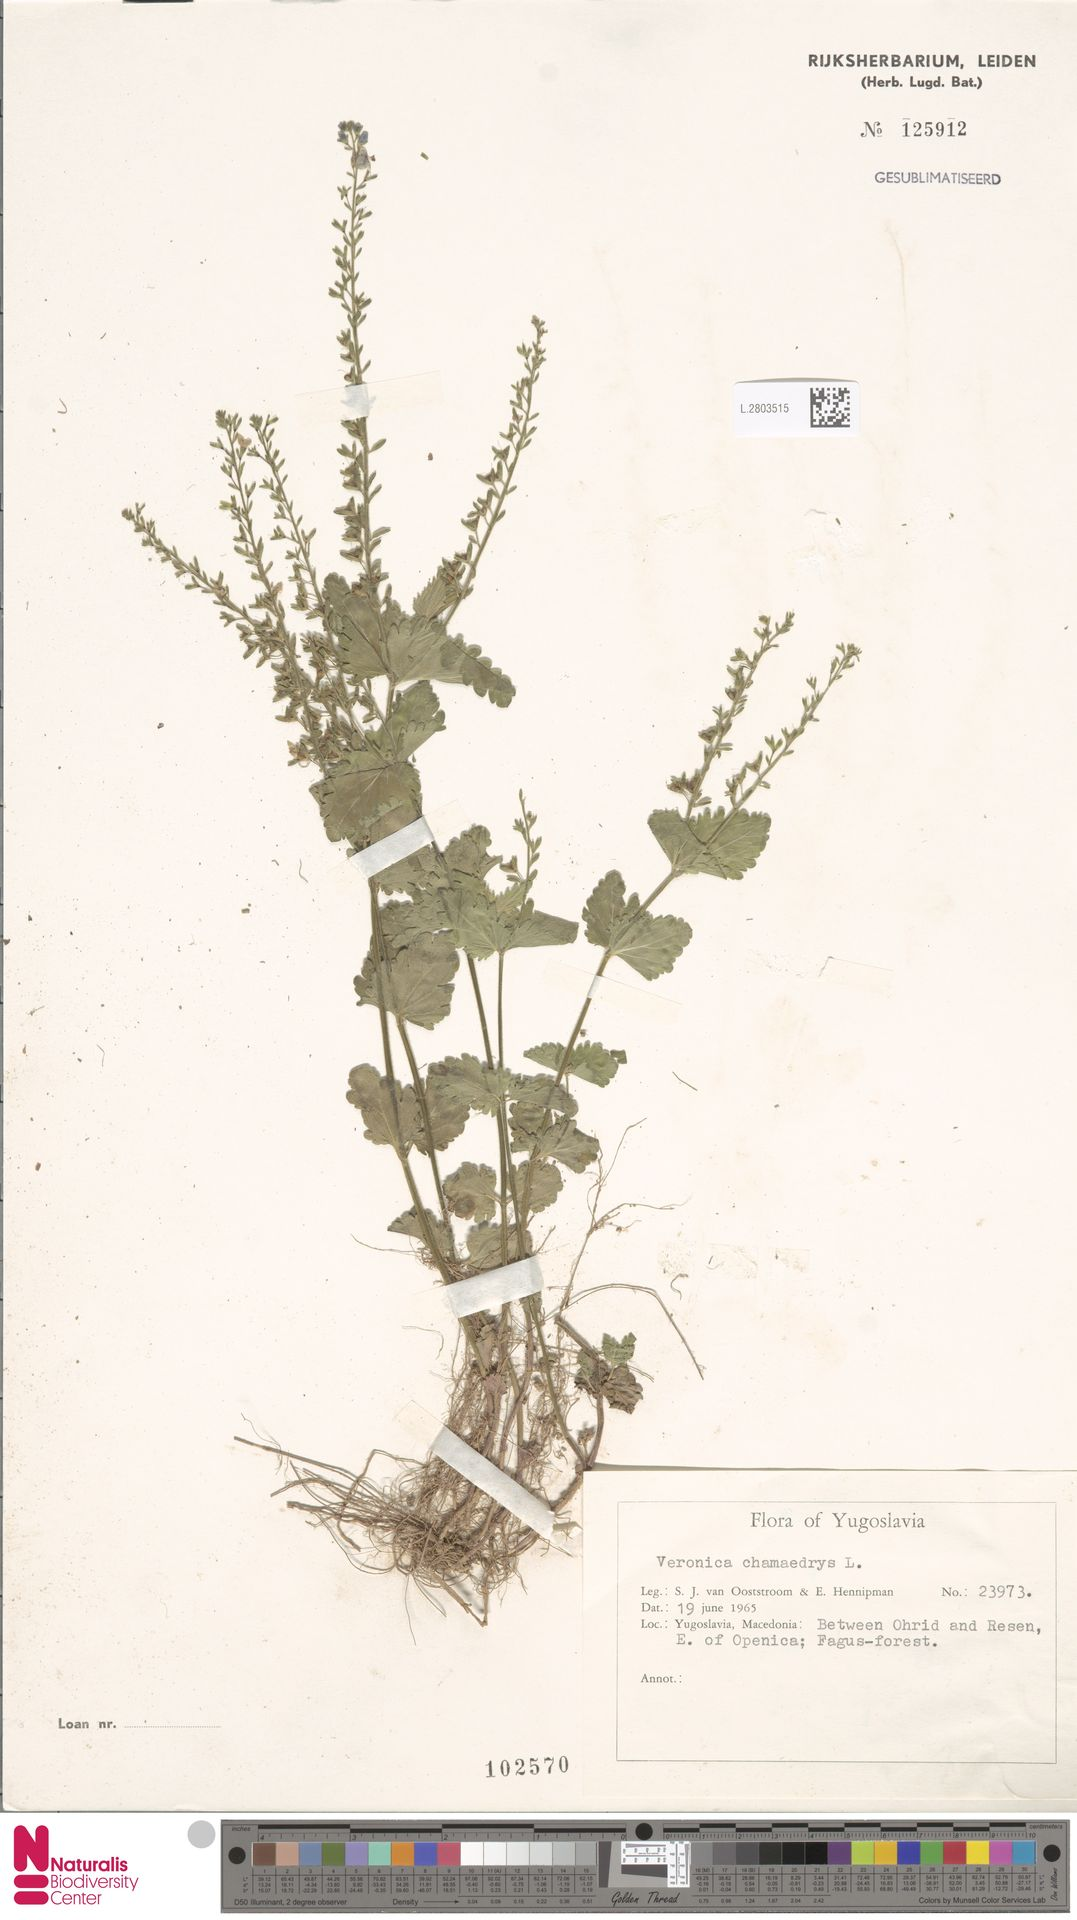 L.2803515 | Veronica chamaedrys L.